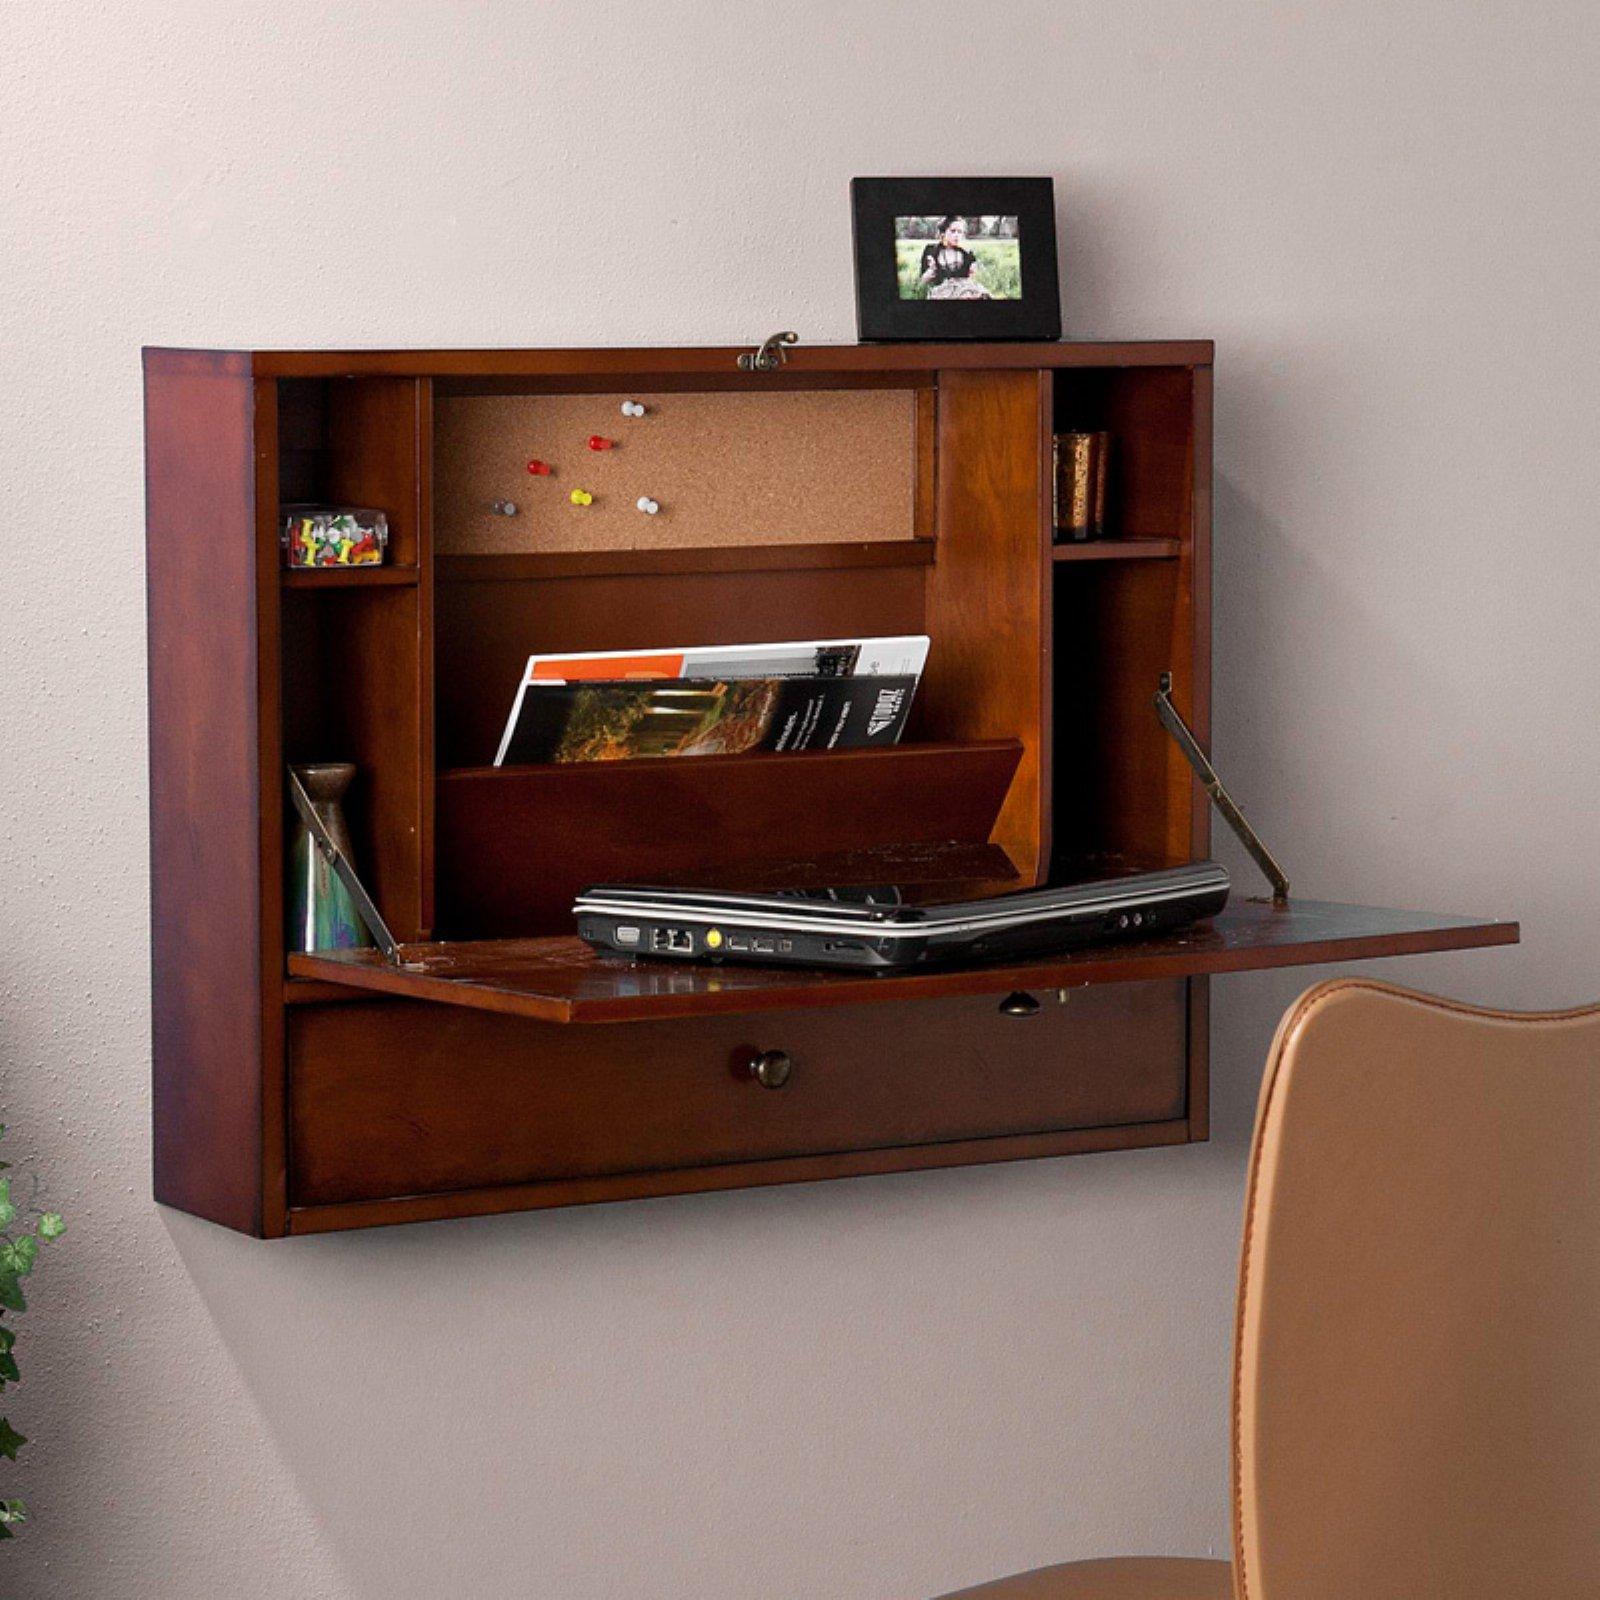 SEI Wall-Mounted Fold Down Laptop Desk w/ Drawer (brown mahagony) $76 + Free Shipping